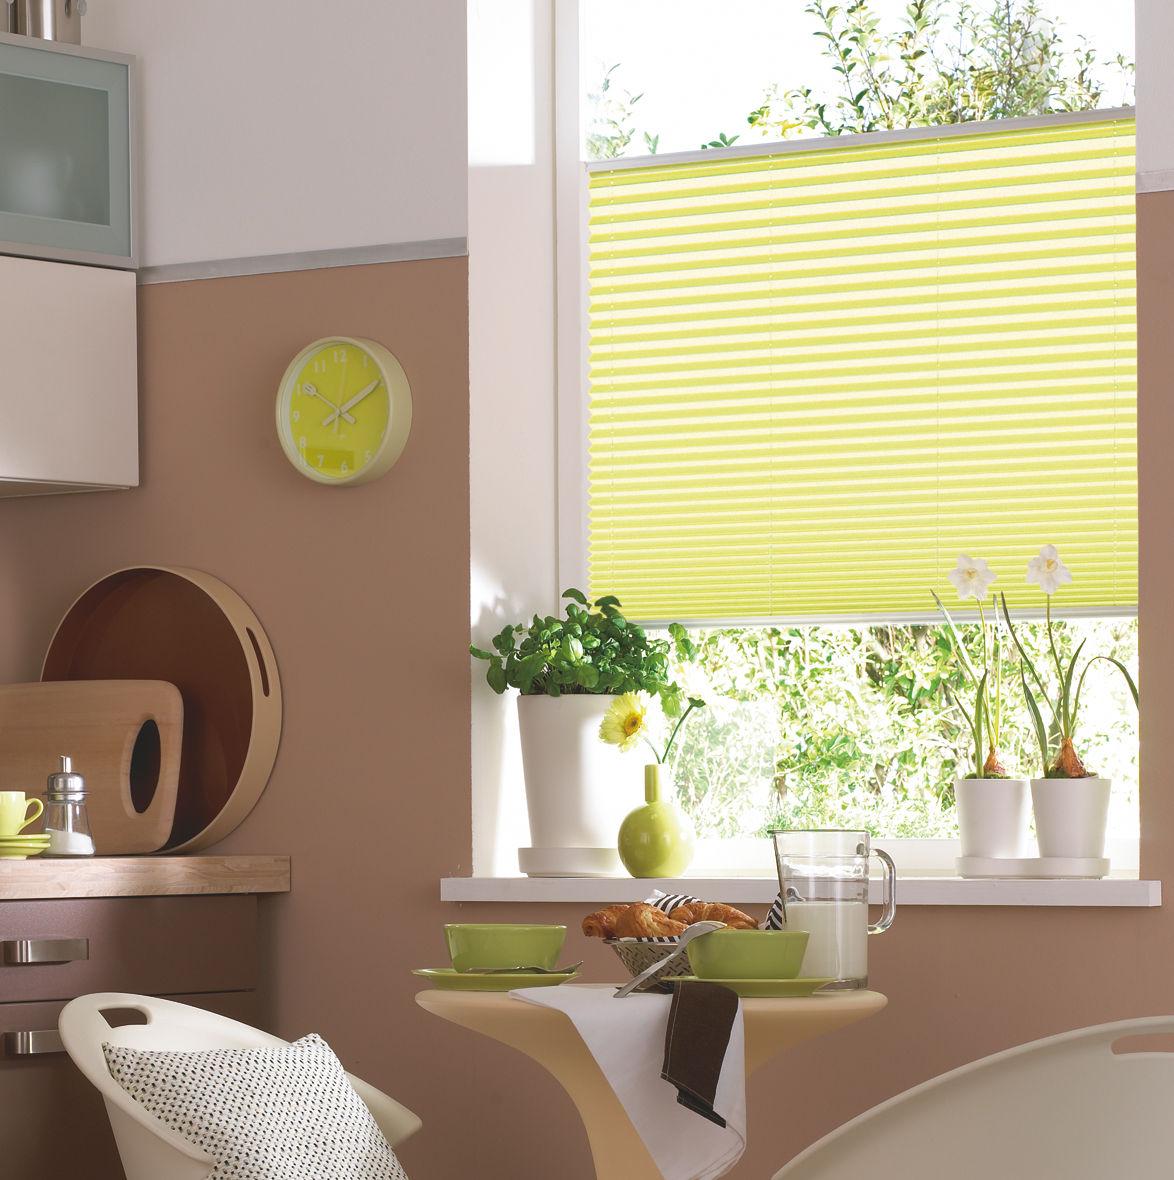 teba plissee elektrische ausfhrung bad plissee with bad plissee cheap beste rollo plissee. Black Bedroom Furniture Sets. Home Design Ideas